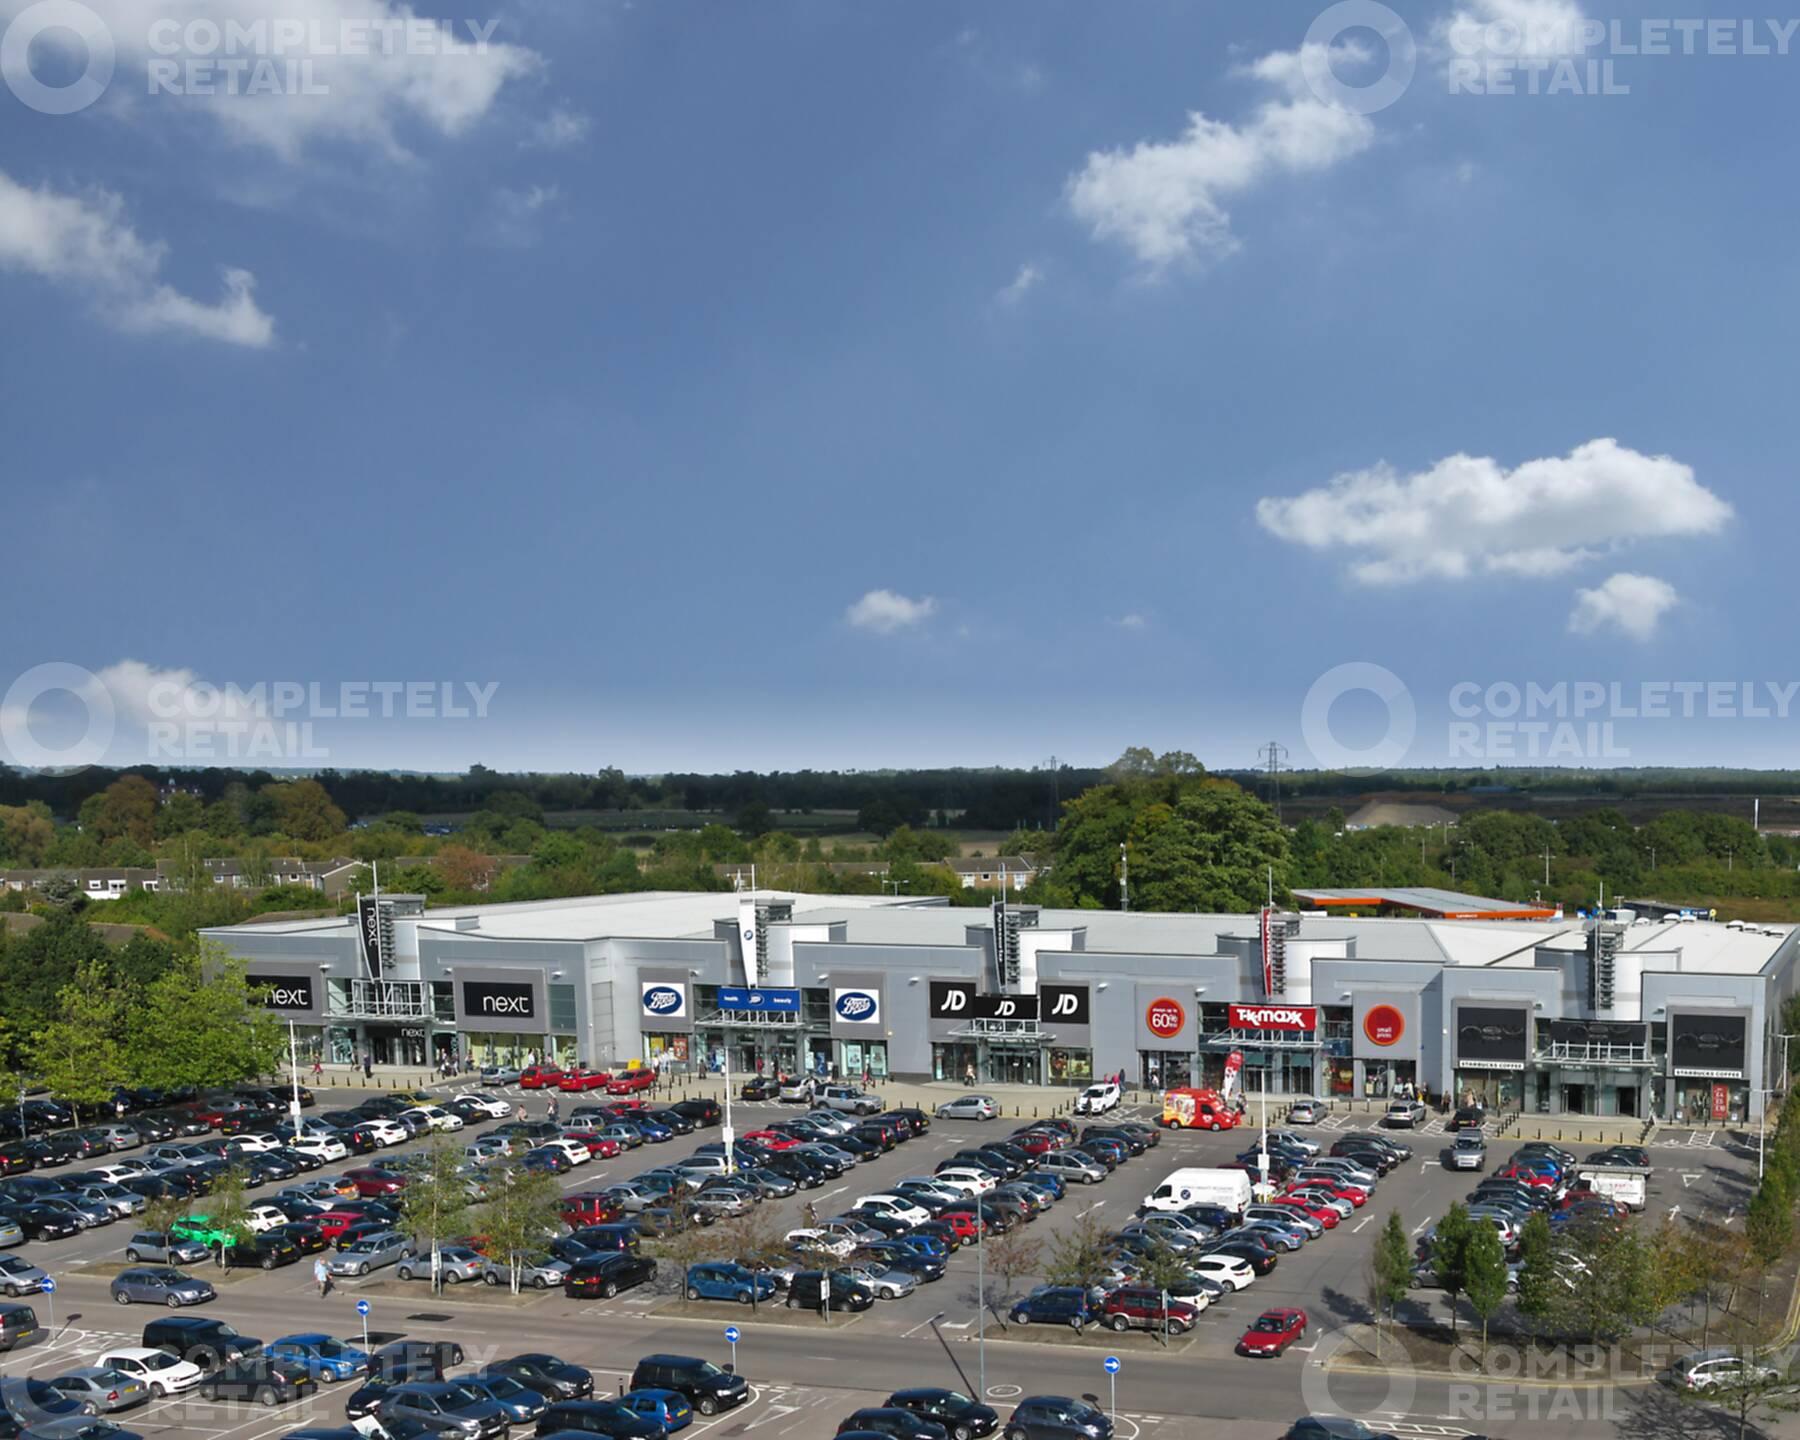 Colney Fields Shopping Park